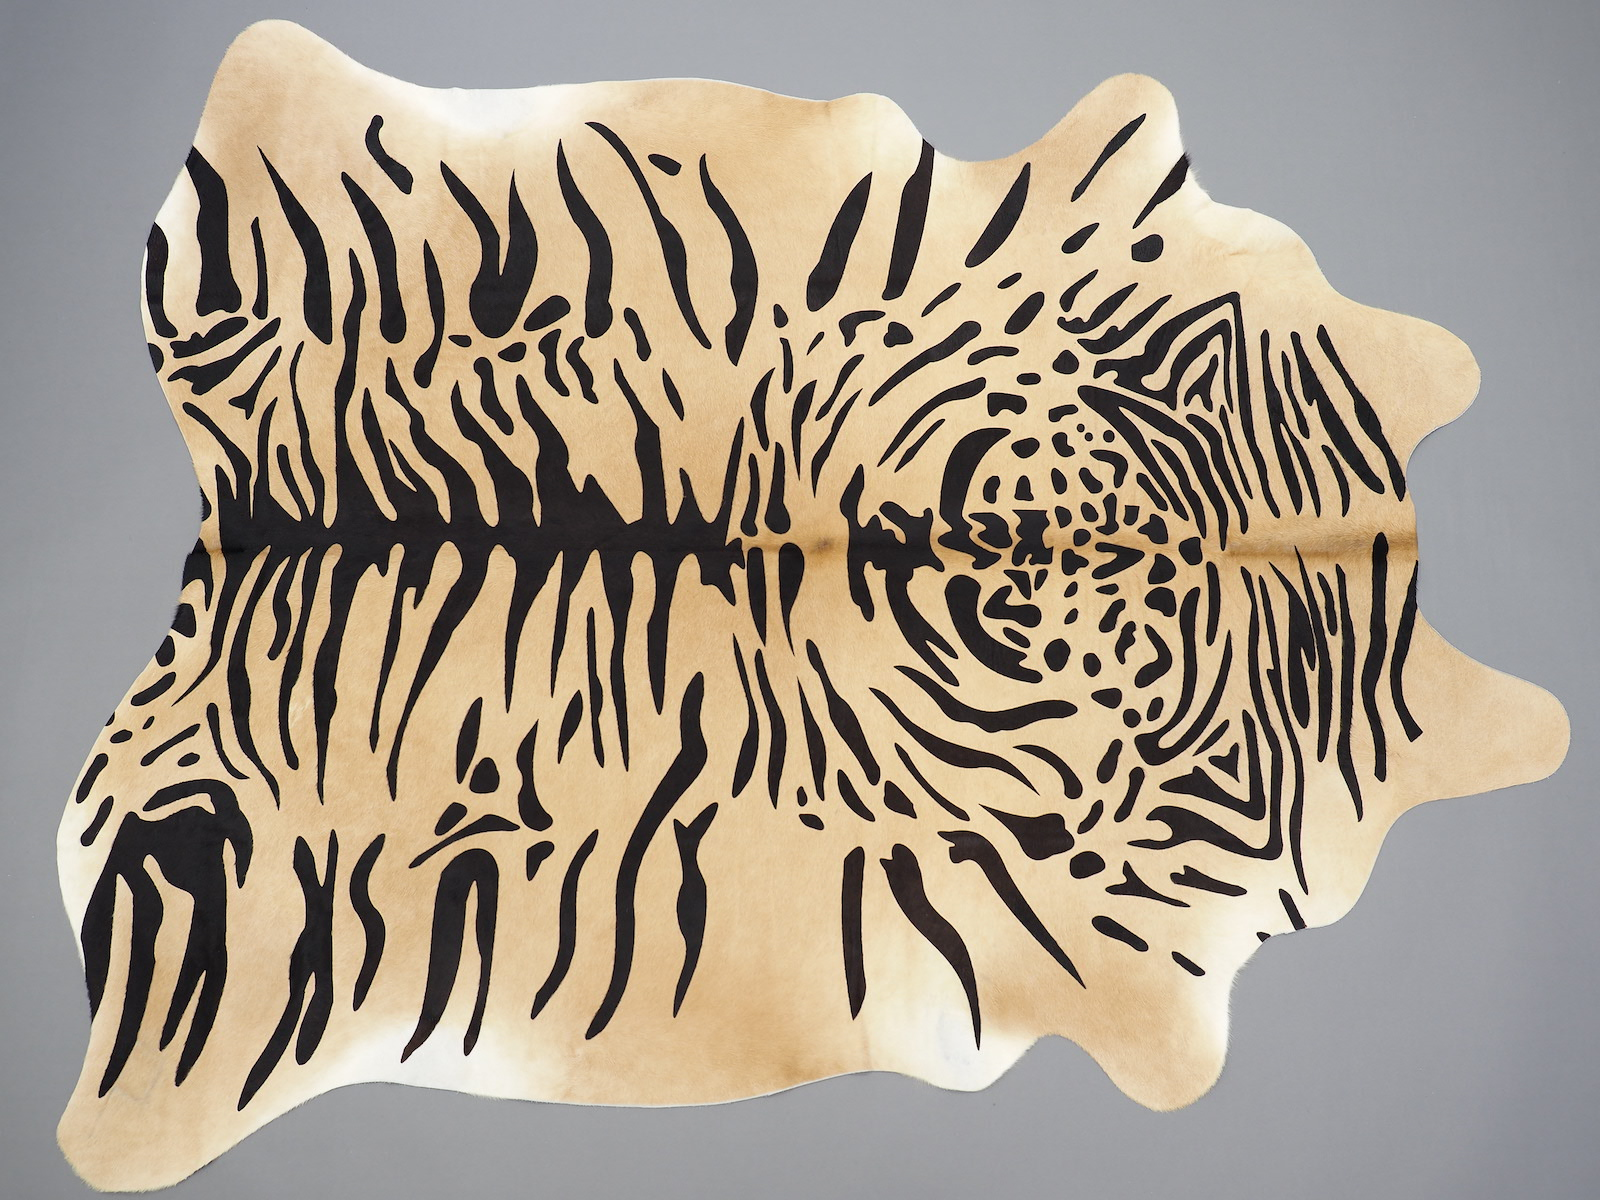 Декоративный ковер-шкура Тигр арт.: 25388